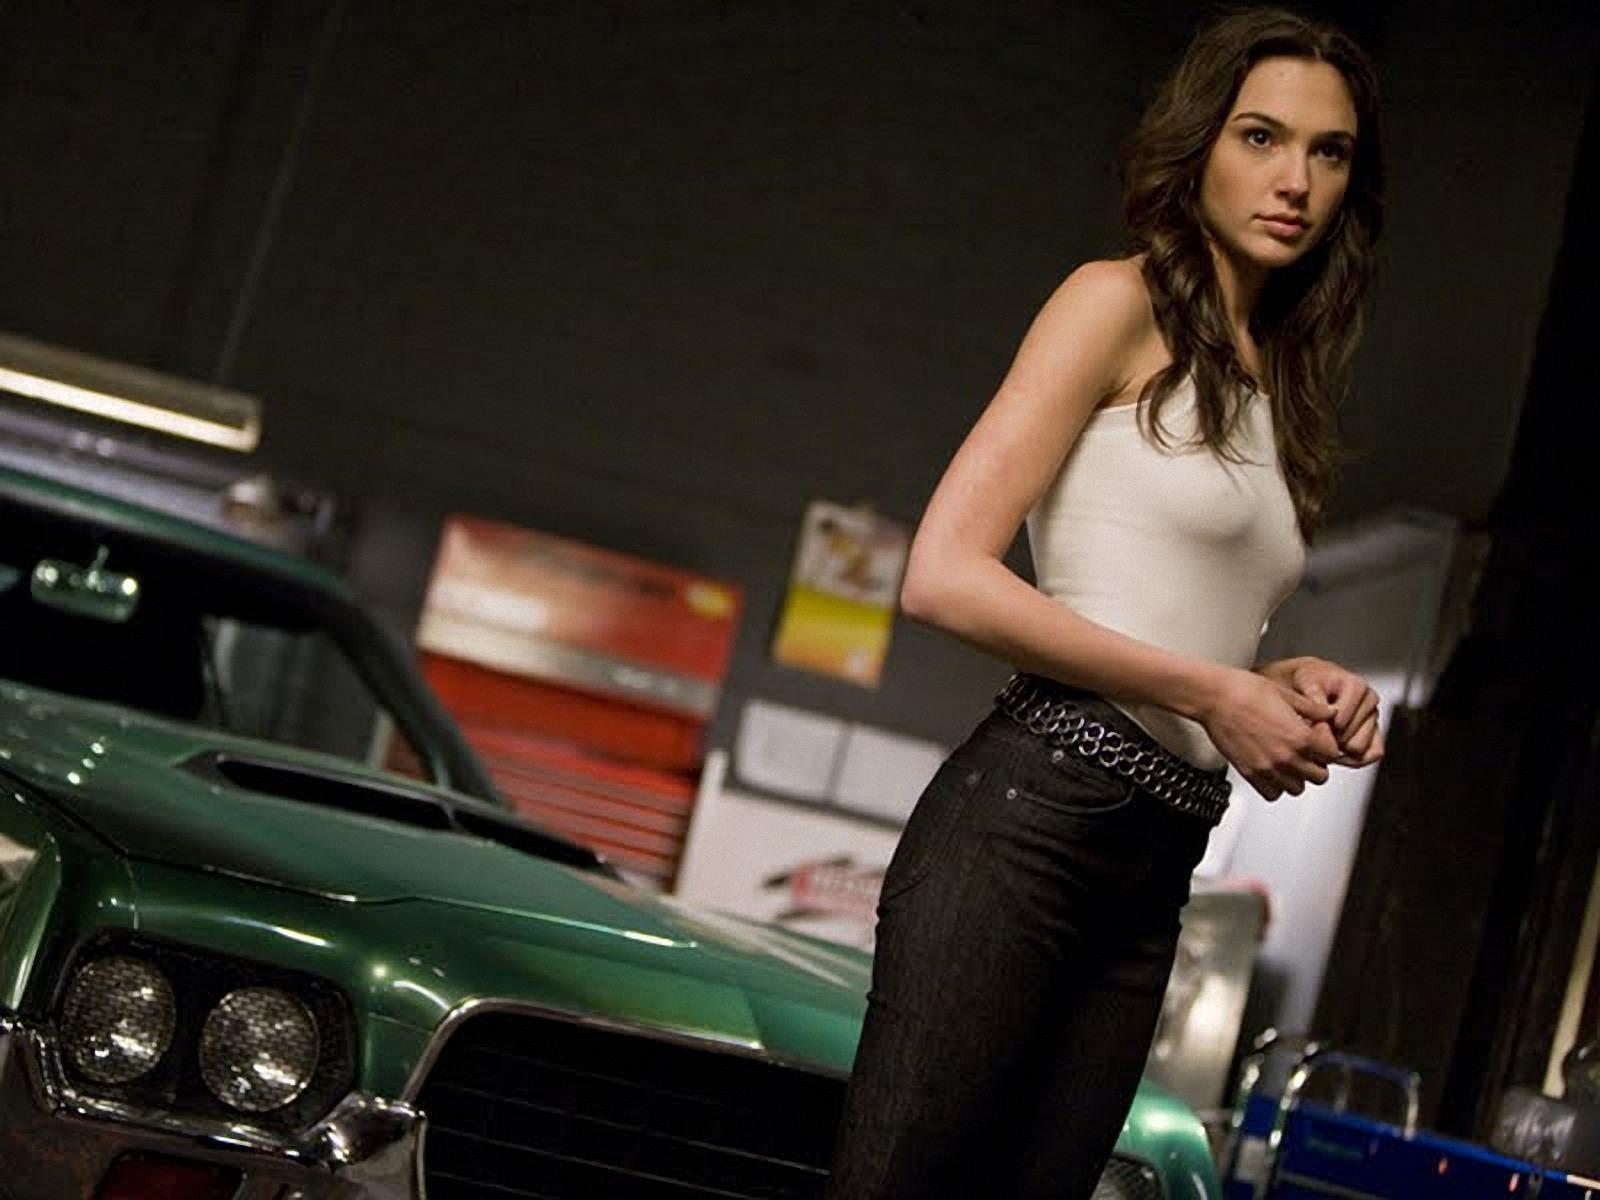 Movie, Fast & Furious(美國, 2009年) / 玩命關頭4(台灣) / 赛车风云(中國) / 狂野時速4(香港), 電影角色與演員介紹